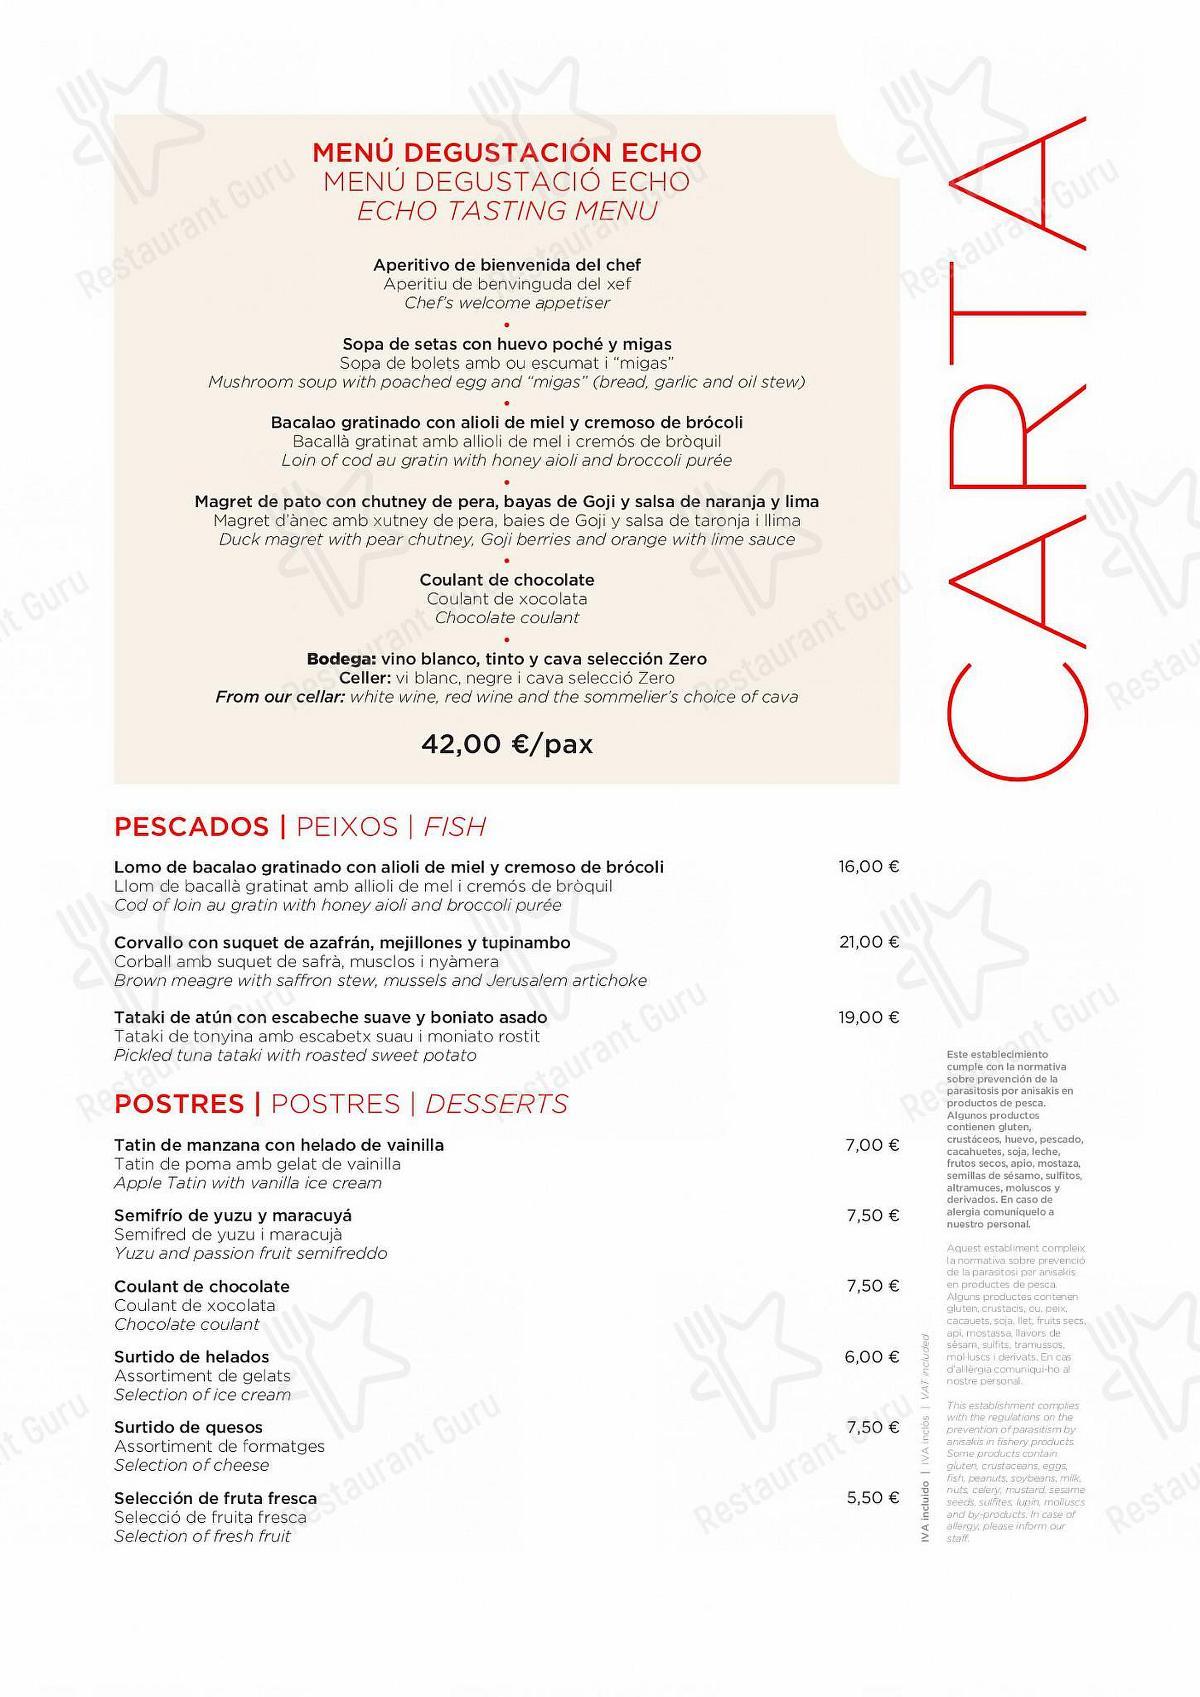 ECHO Restaurant menu - meals and drinks